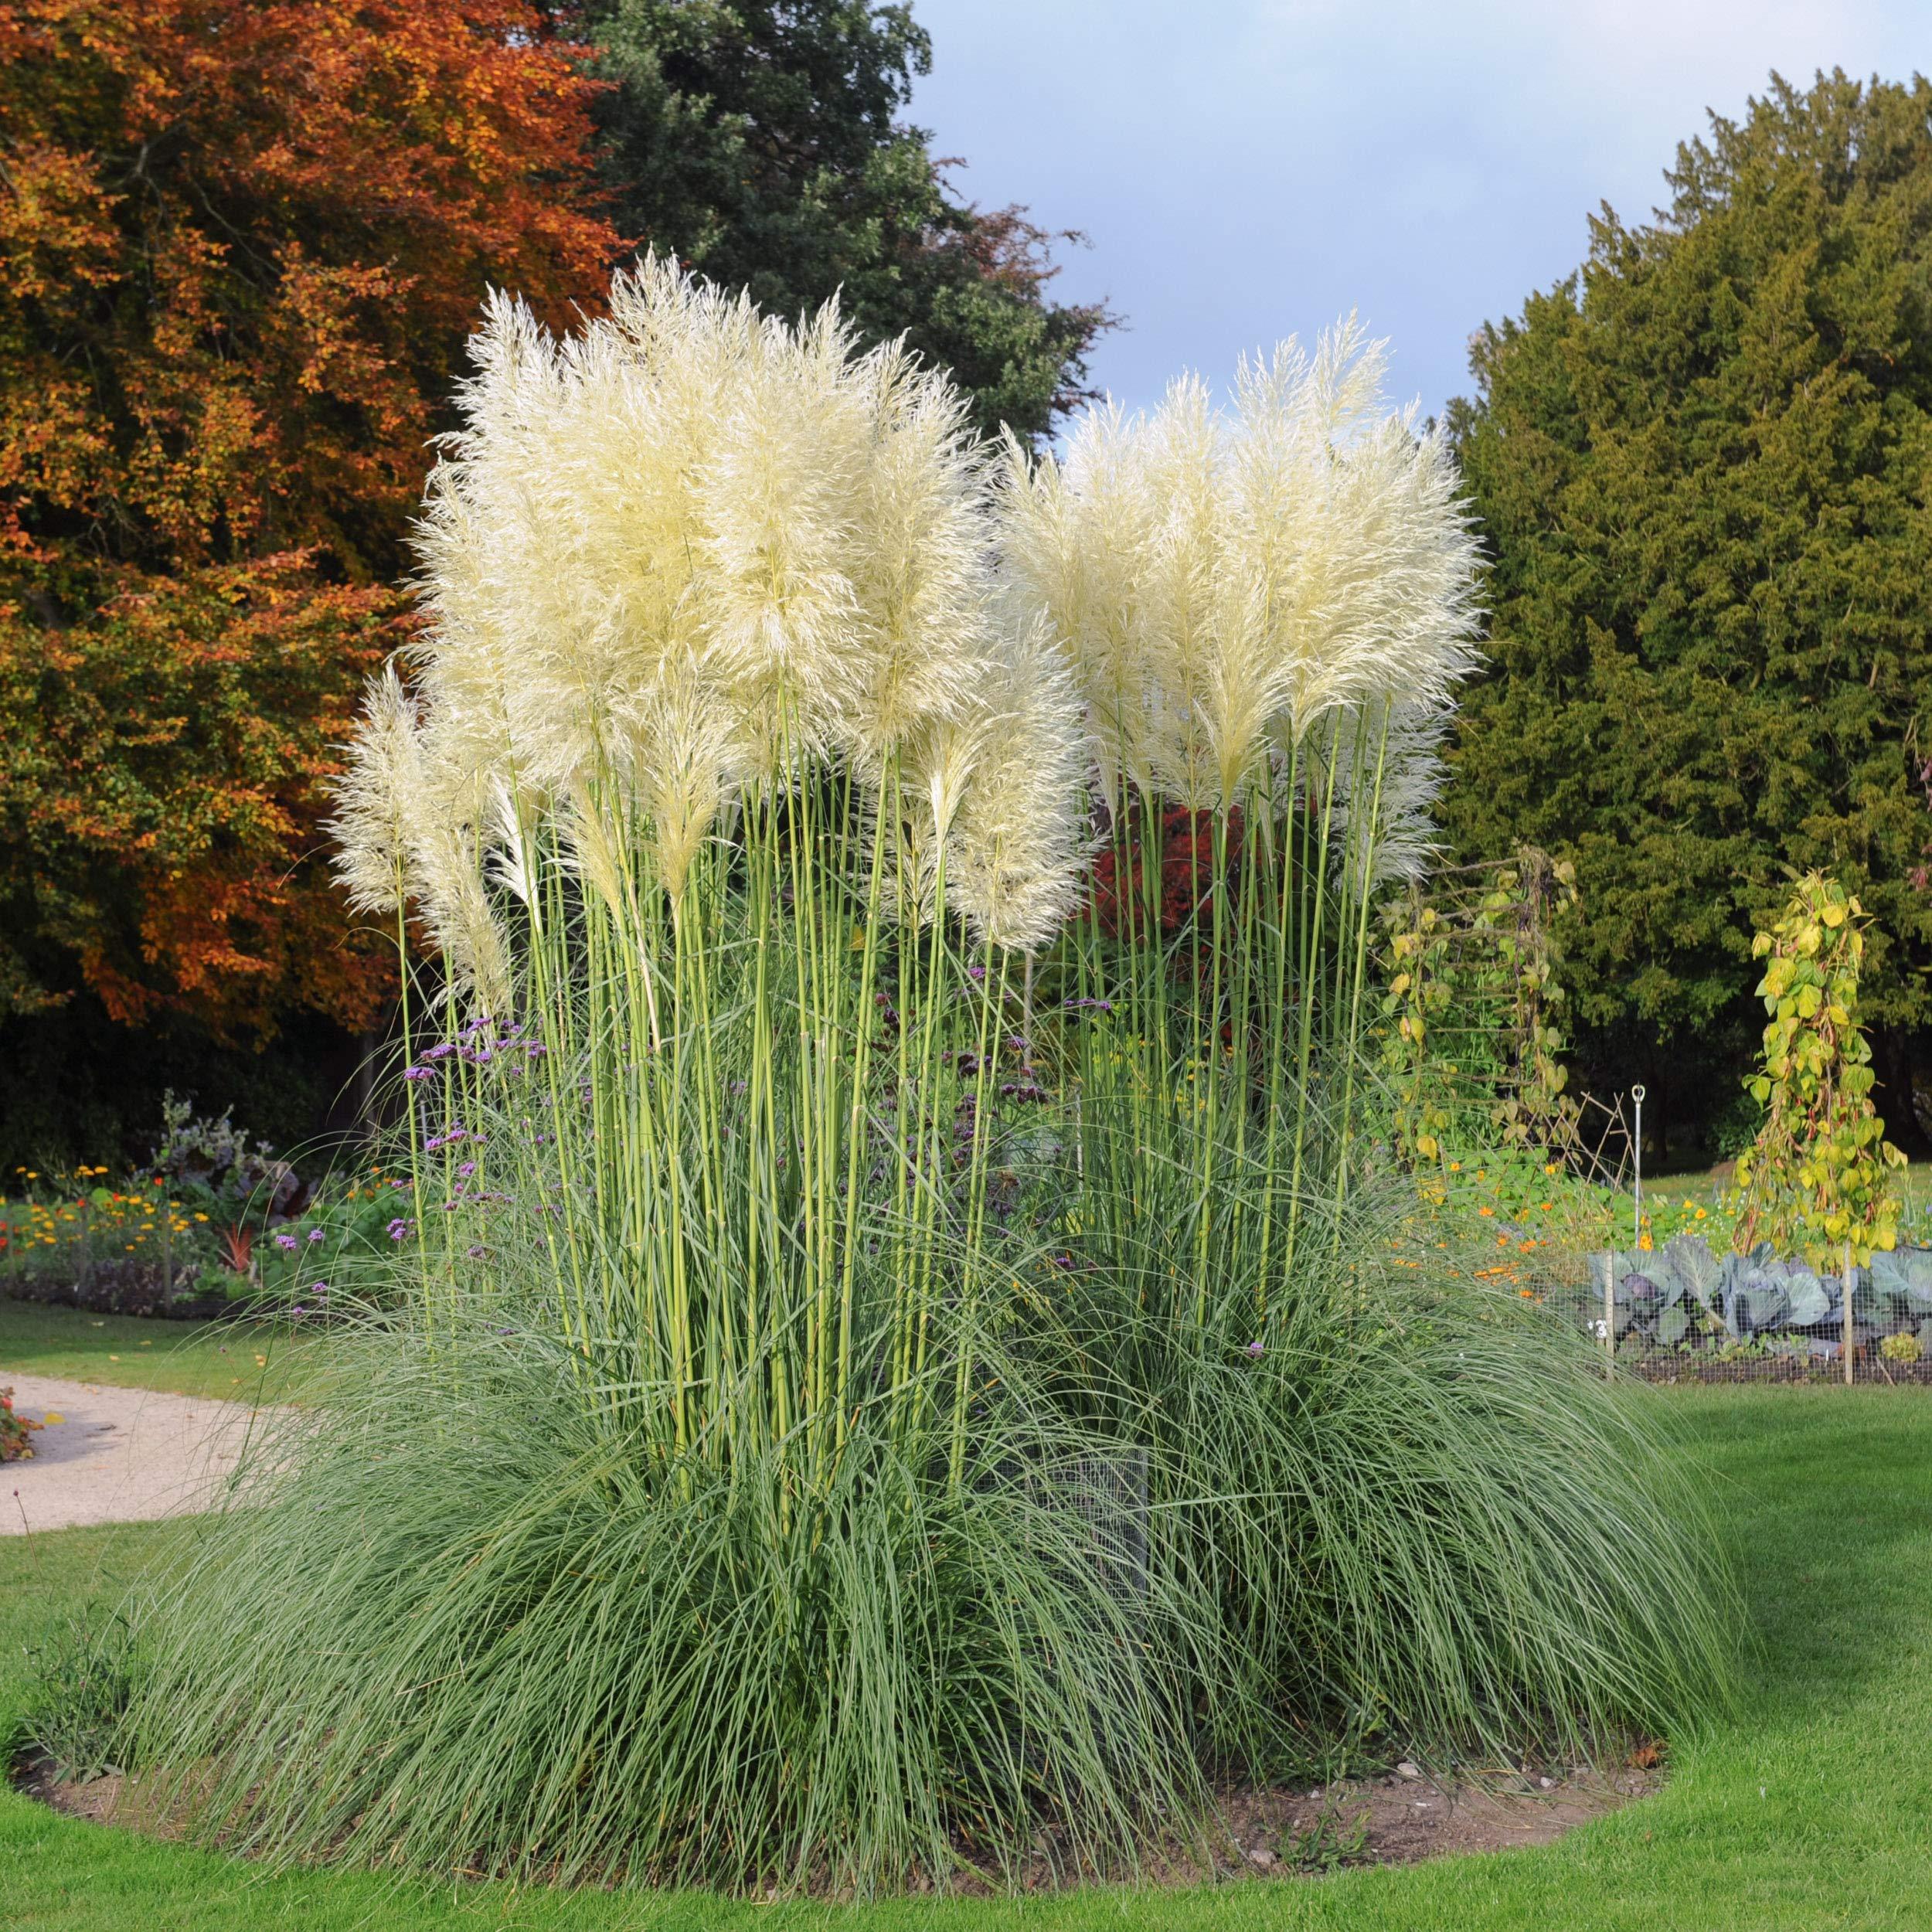 WHITE PAMPAS ORNAMENTAL GRASS Over 1,000 SEEDS